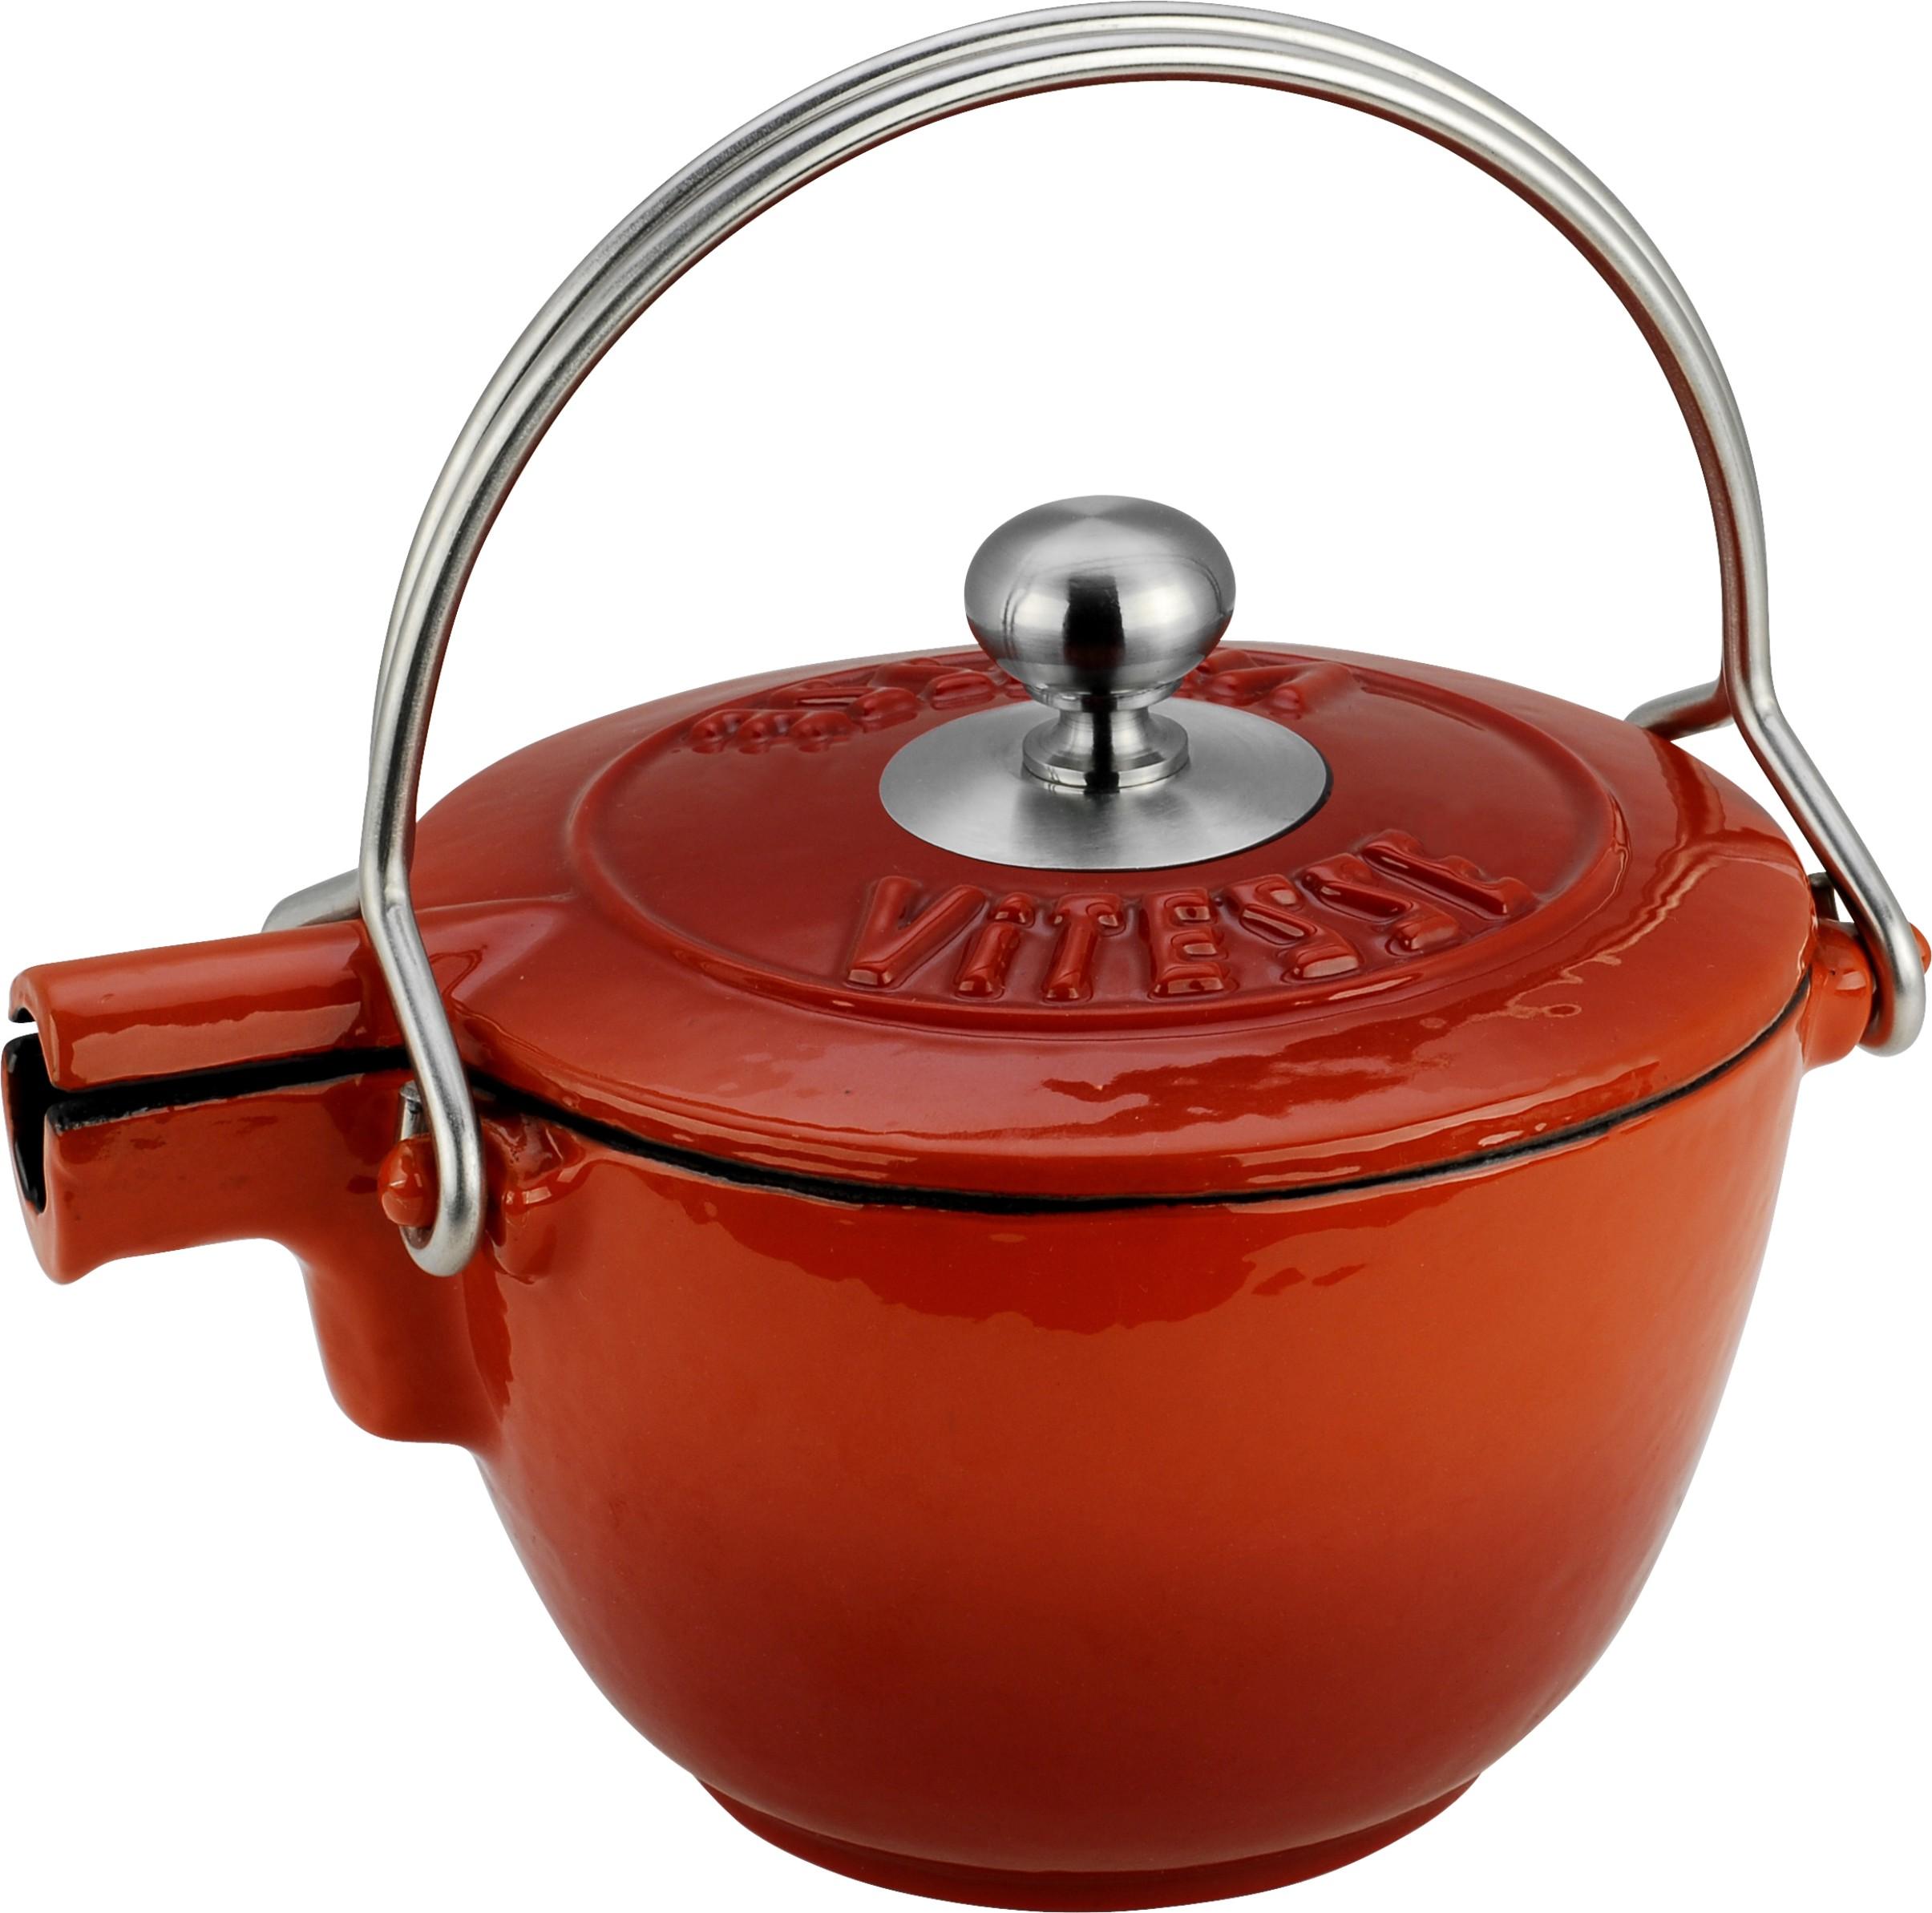 Чайник заварочный VitesseЧайники заварочные<br>Тип: чайник заварочный,<br>Объем: 1.15,<br>Цвет: красный,<br>Материал: чугун,<br>Вес нетто: 2.5<br>